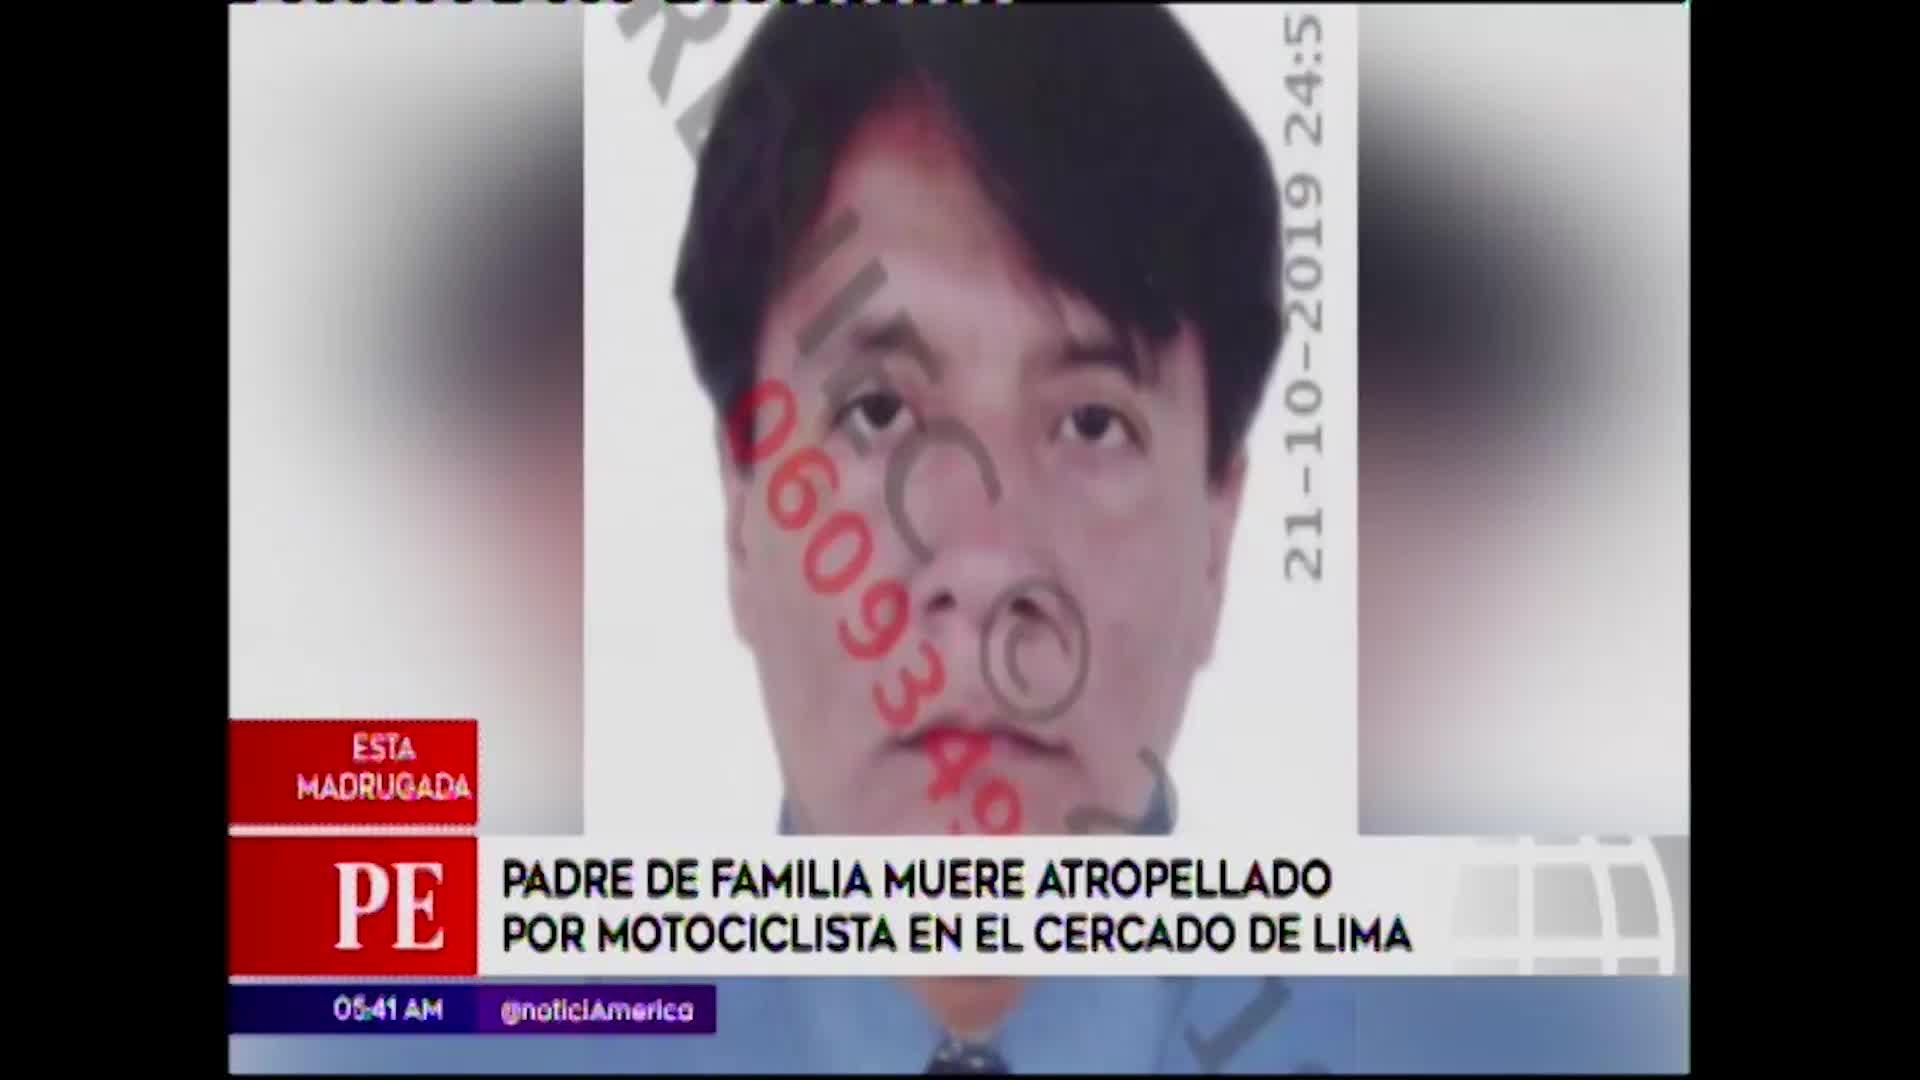 Cercado de Lima: hombre fallece tras ser embestido por motociclista